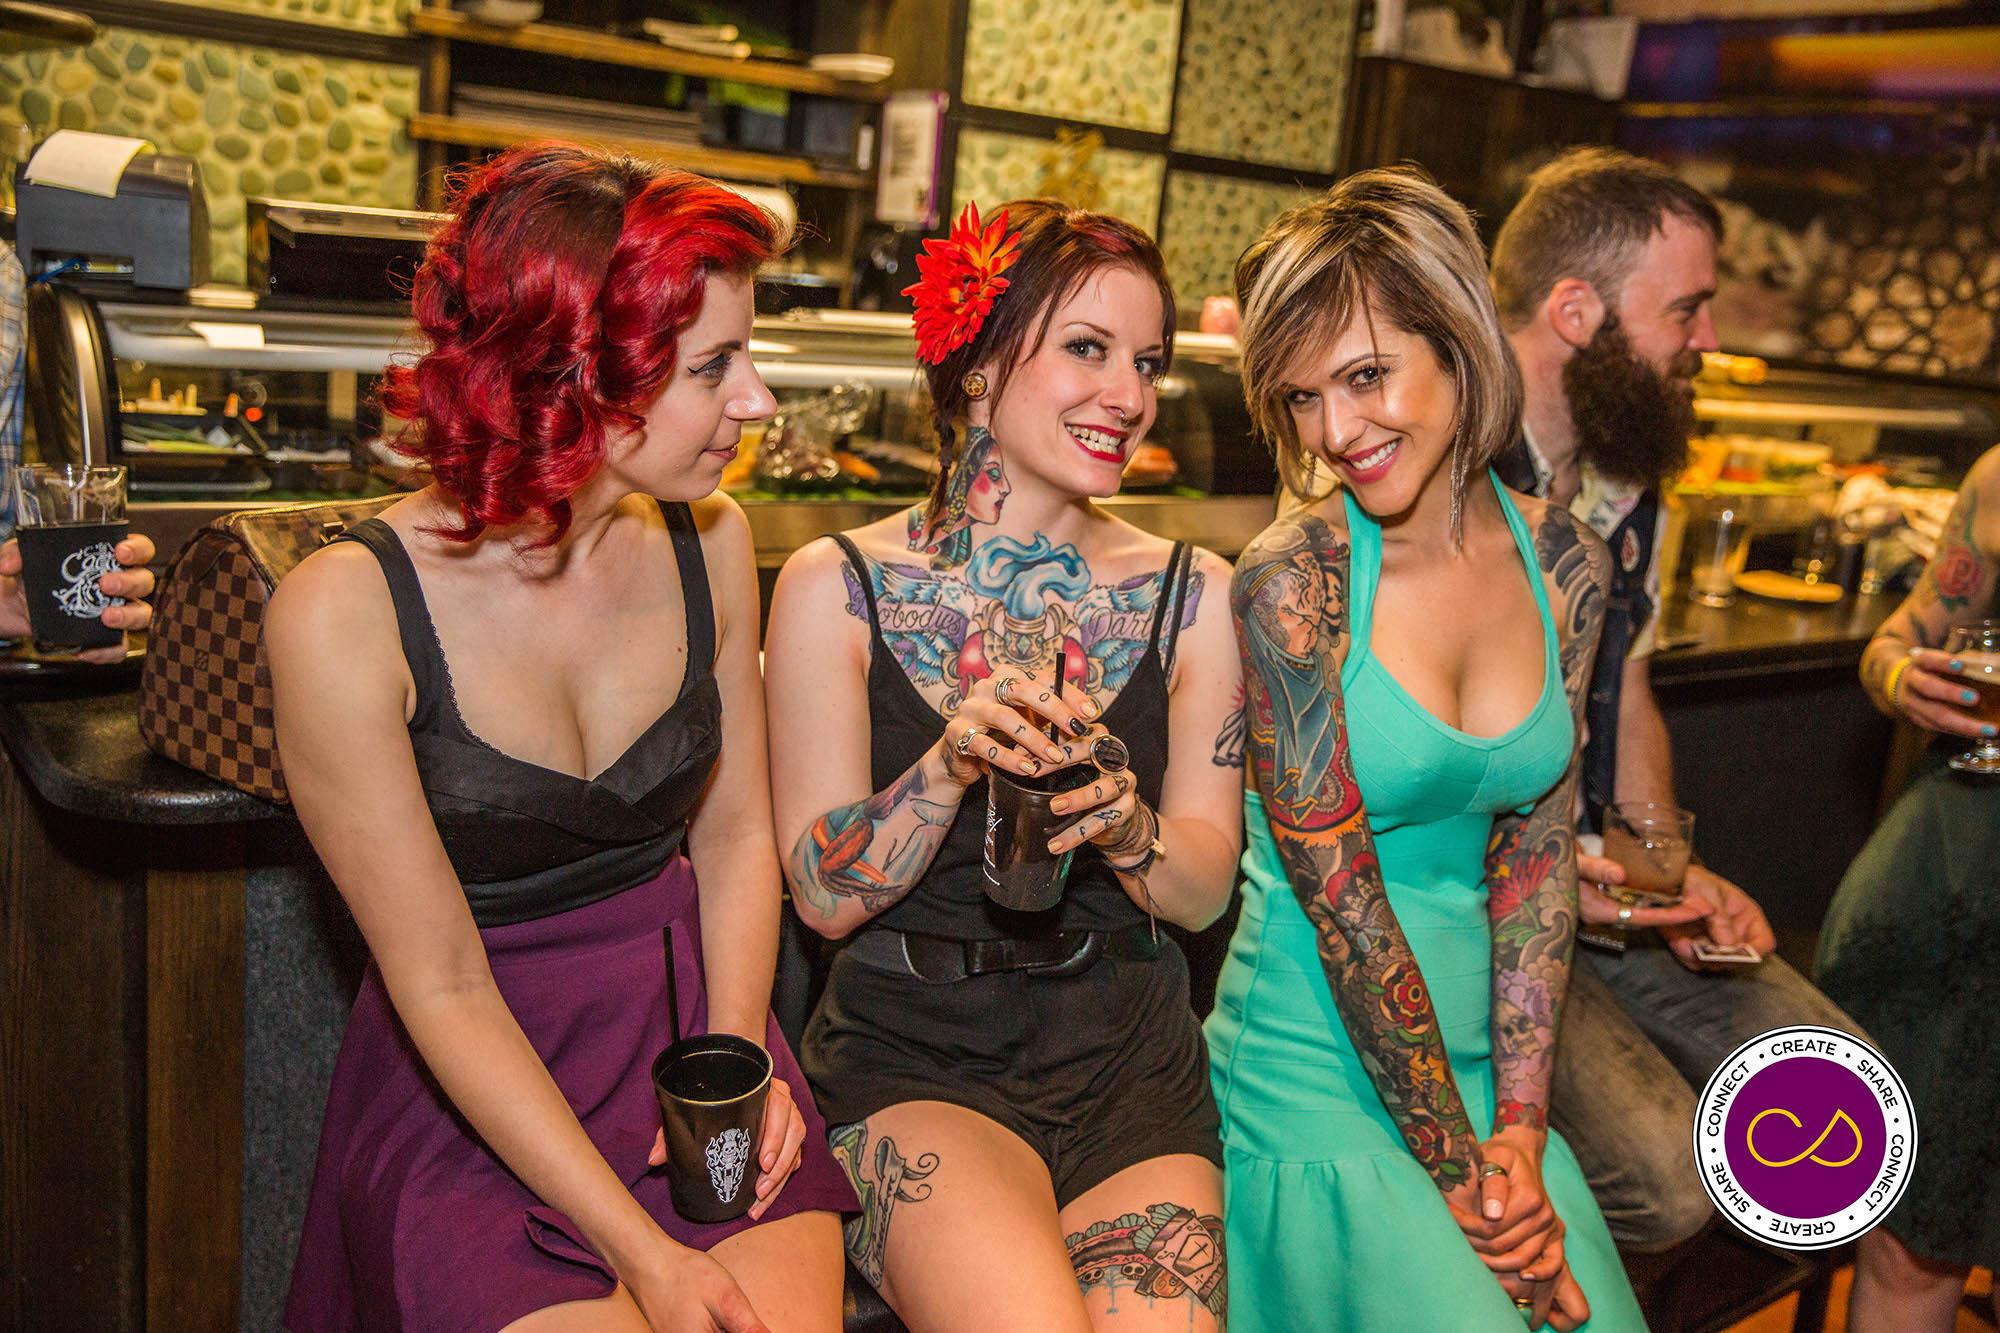 opus-tattoo-celebration-may-2015-creative-salem_1982_18070582496_o.jpg